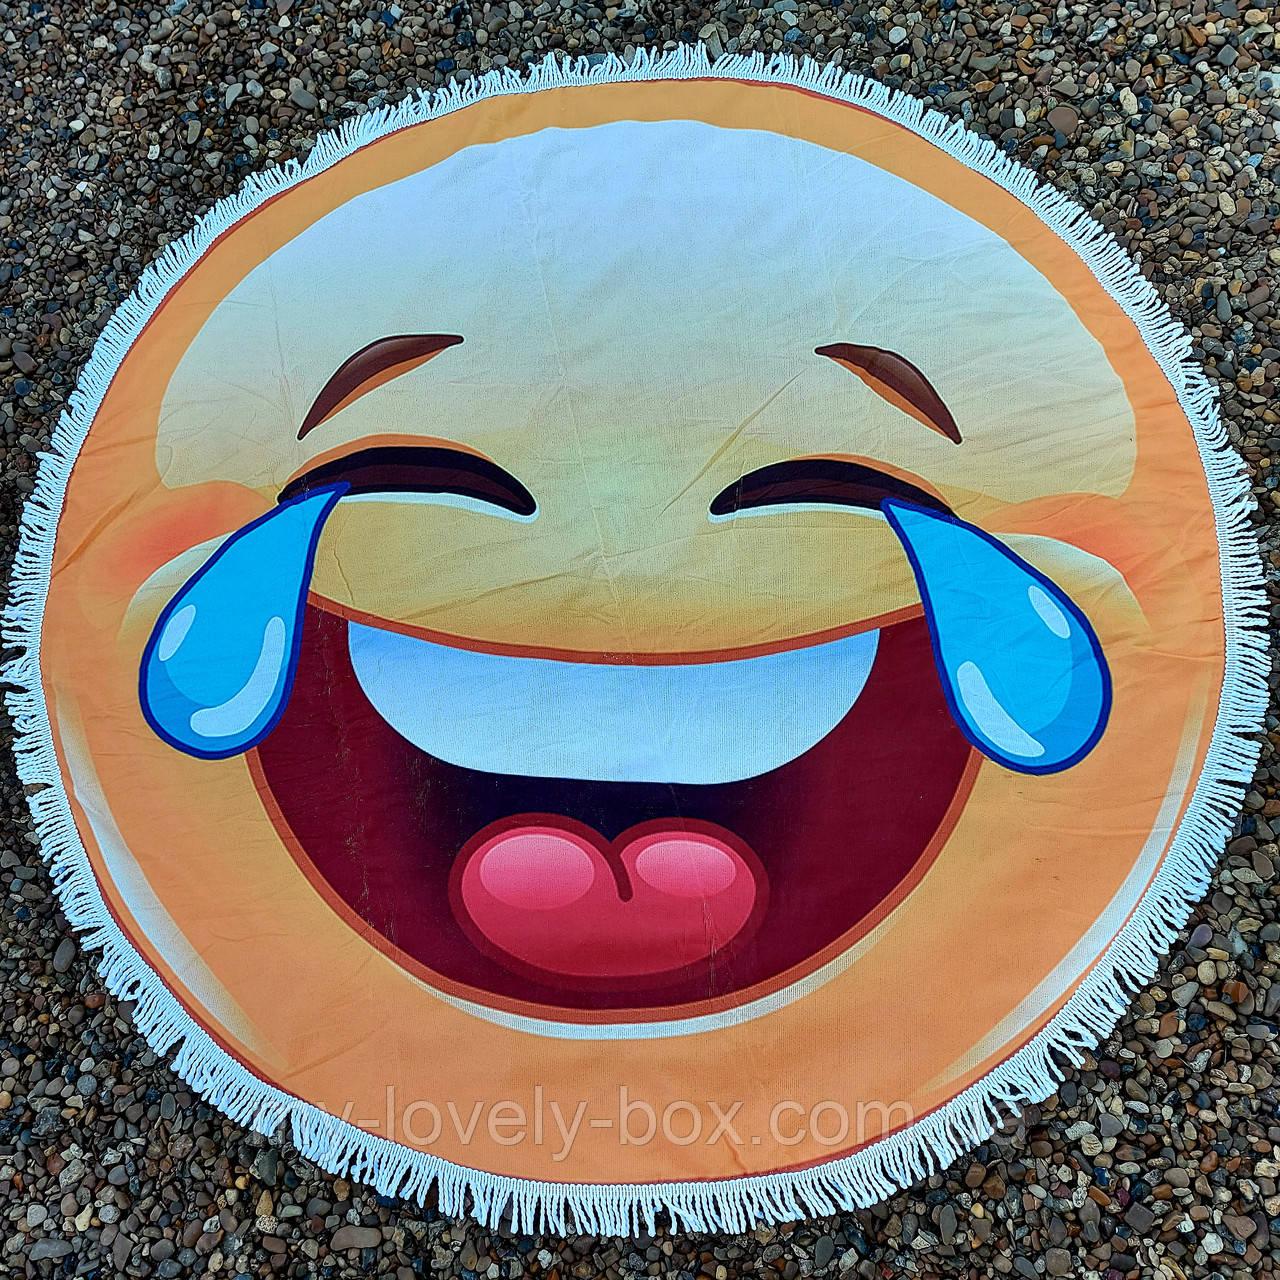 Рушник-пляжний килимок кругле (Арт. TPA113/12)